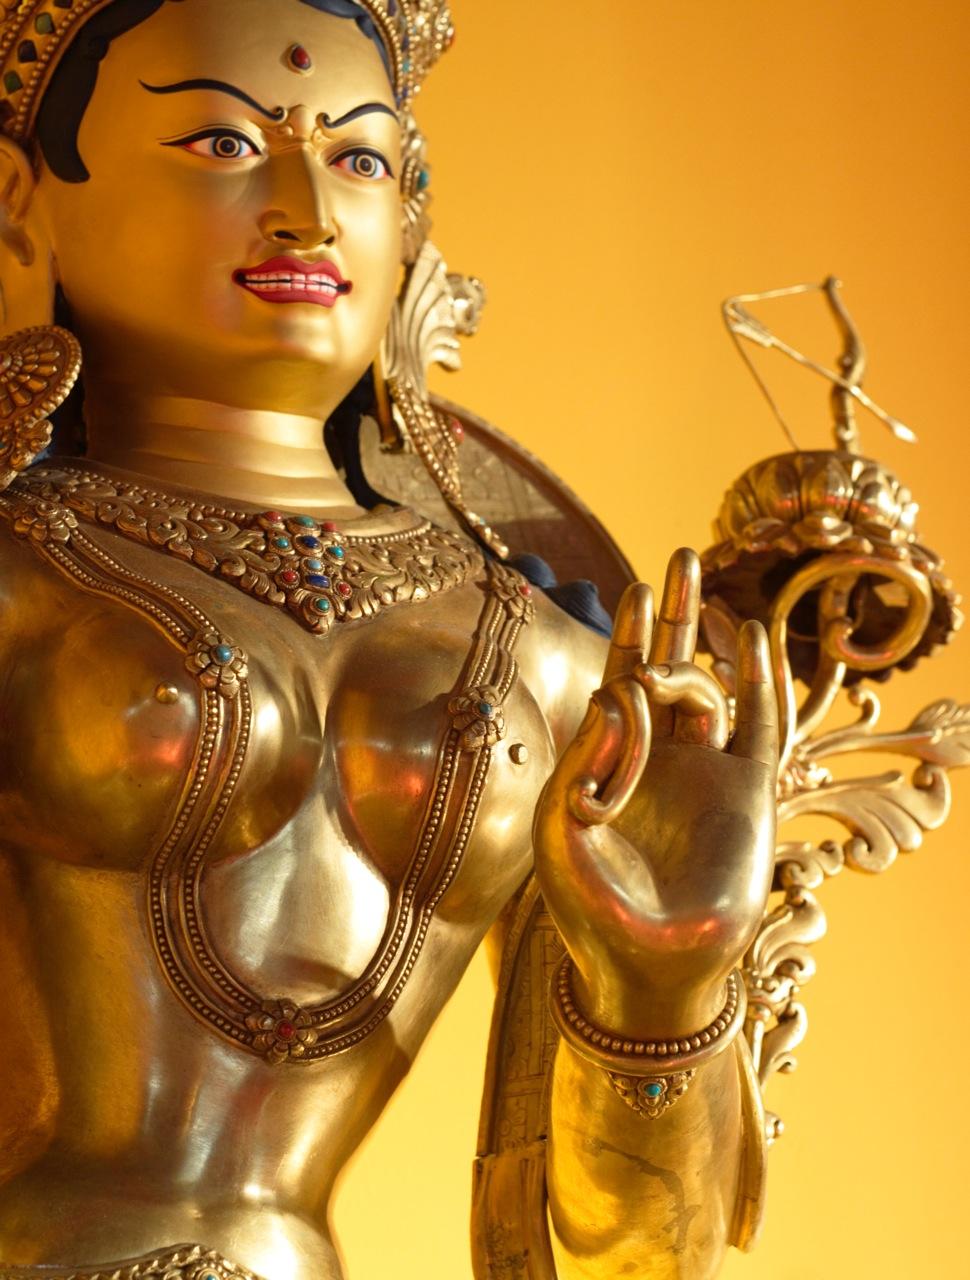 Tara, Yoga & Female Buddhas - Ep. 195 of the Bob Thurman Podcast Tara statue photo via www.luminousbuddha.com.